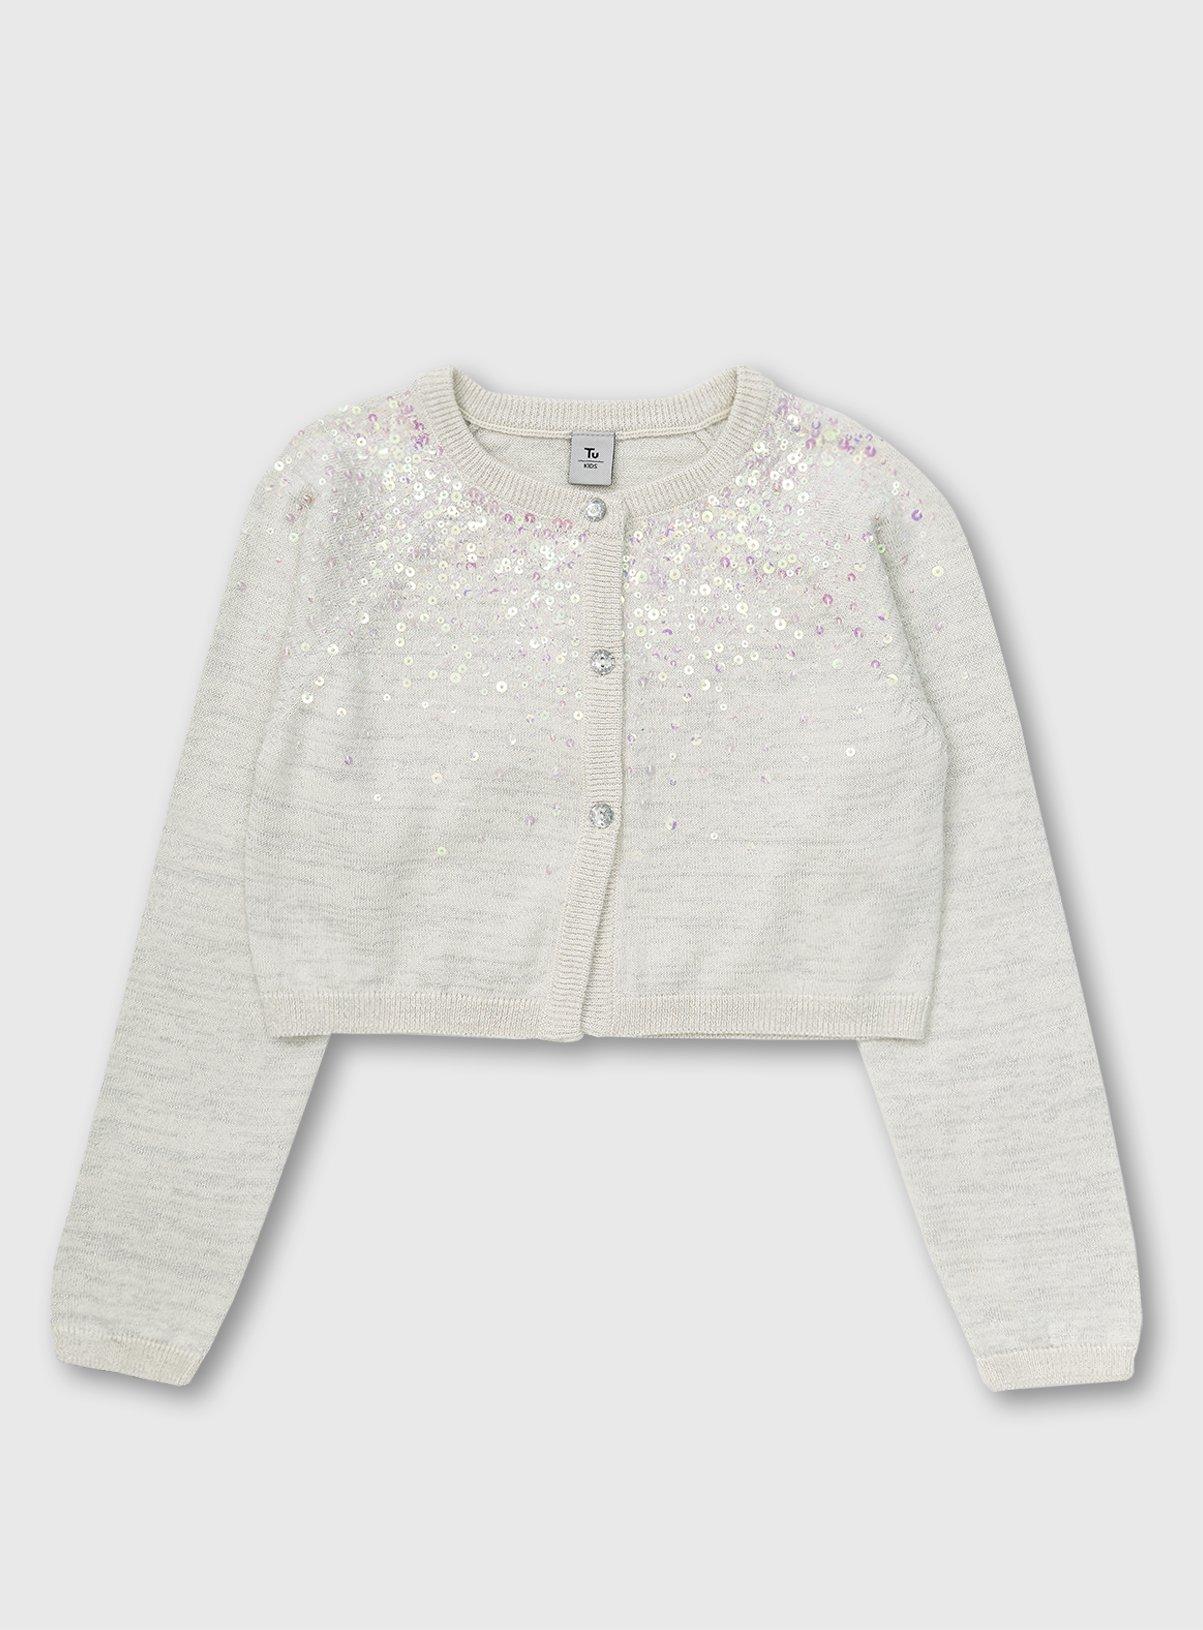 White Glitter Yoke Long Sleeve Bolero - 13 years